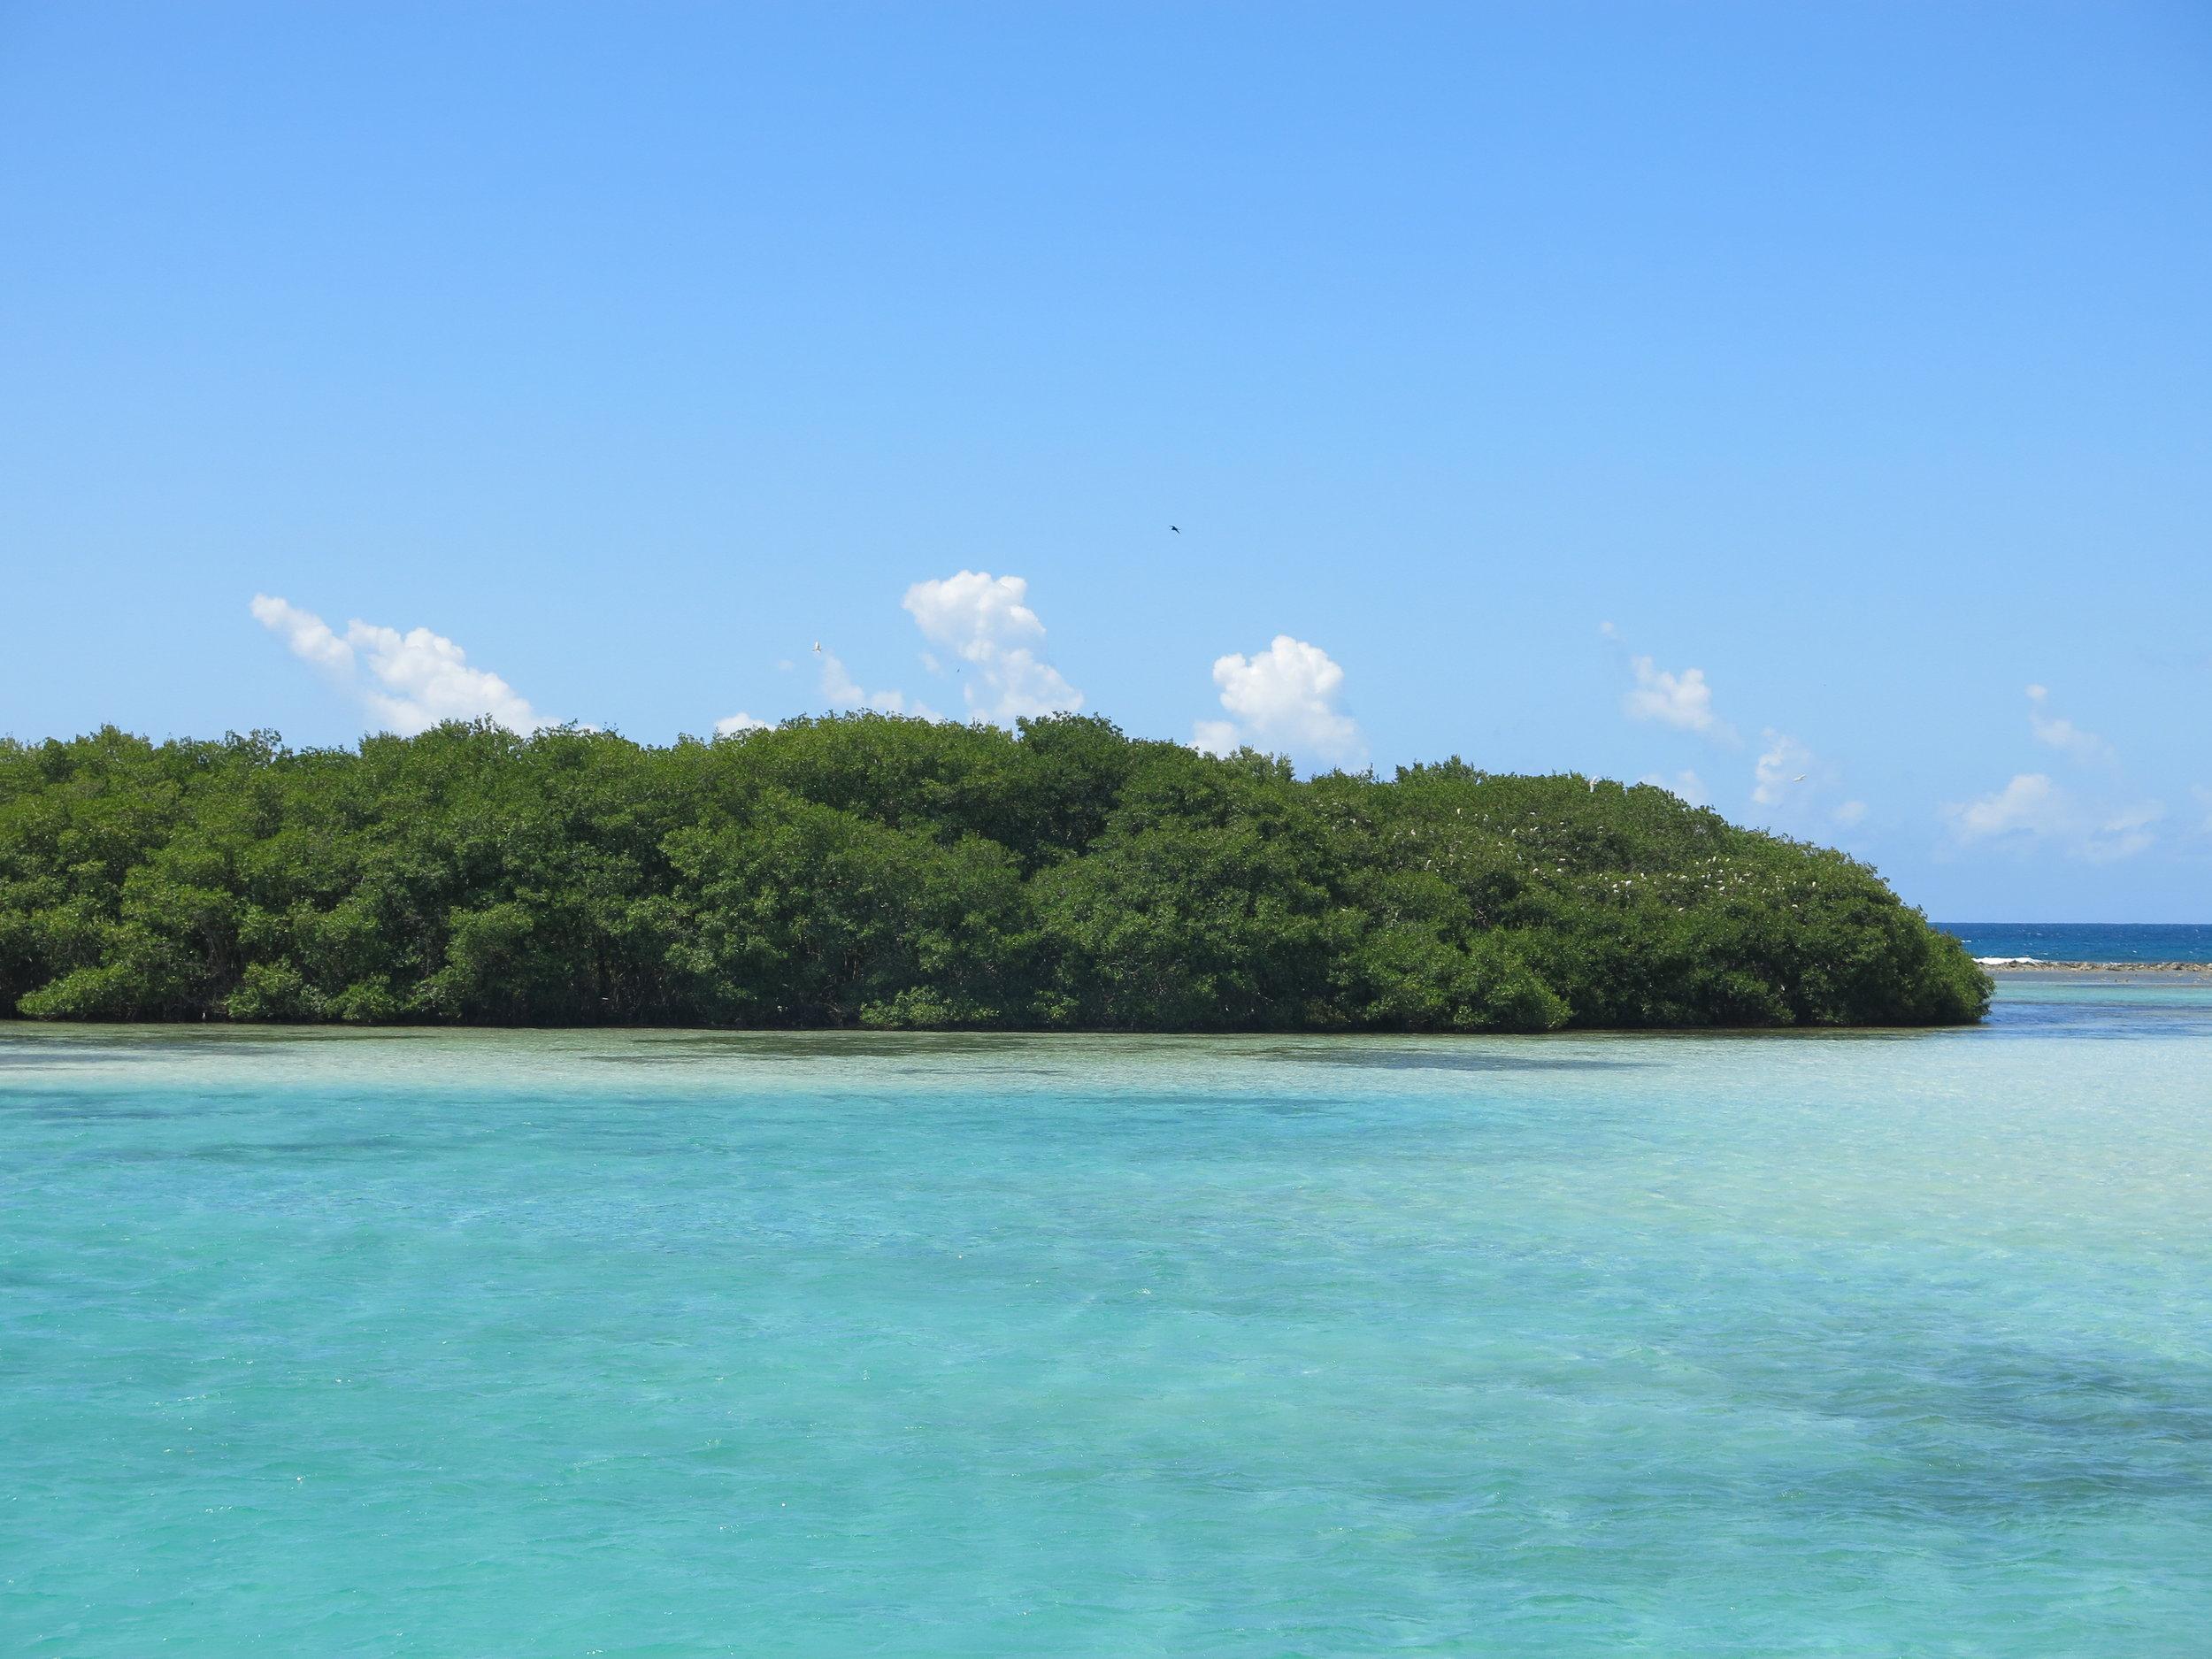 Mangroves in Boca Chica, Dominican Republic